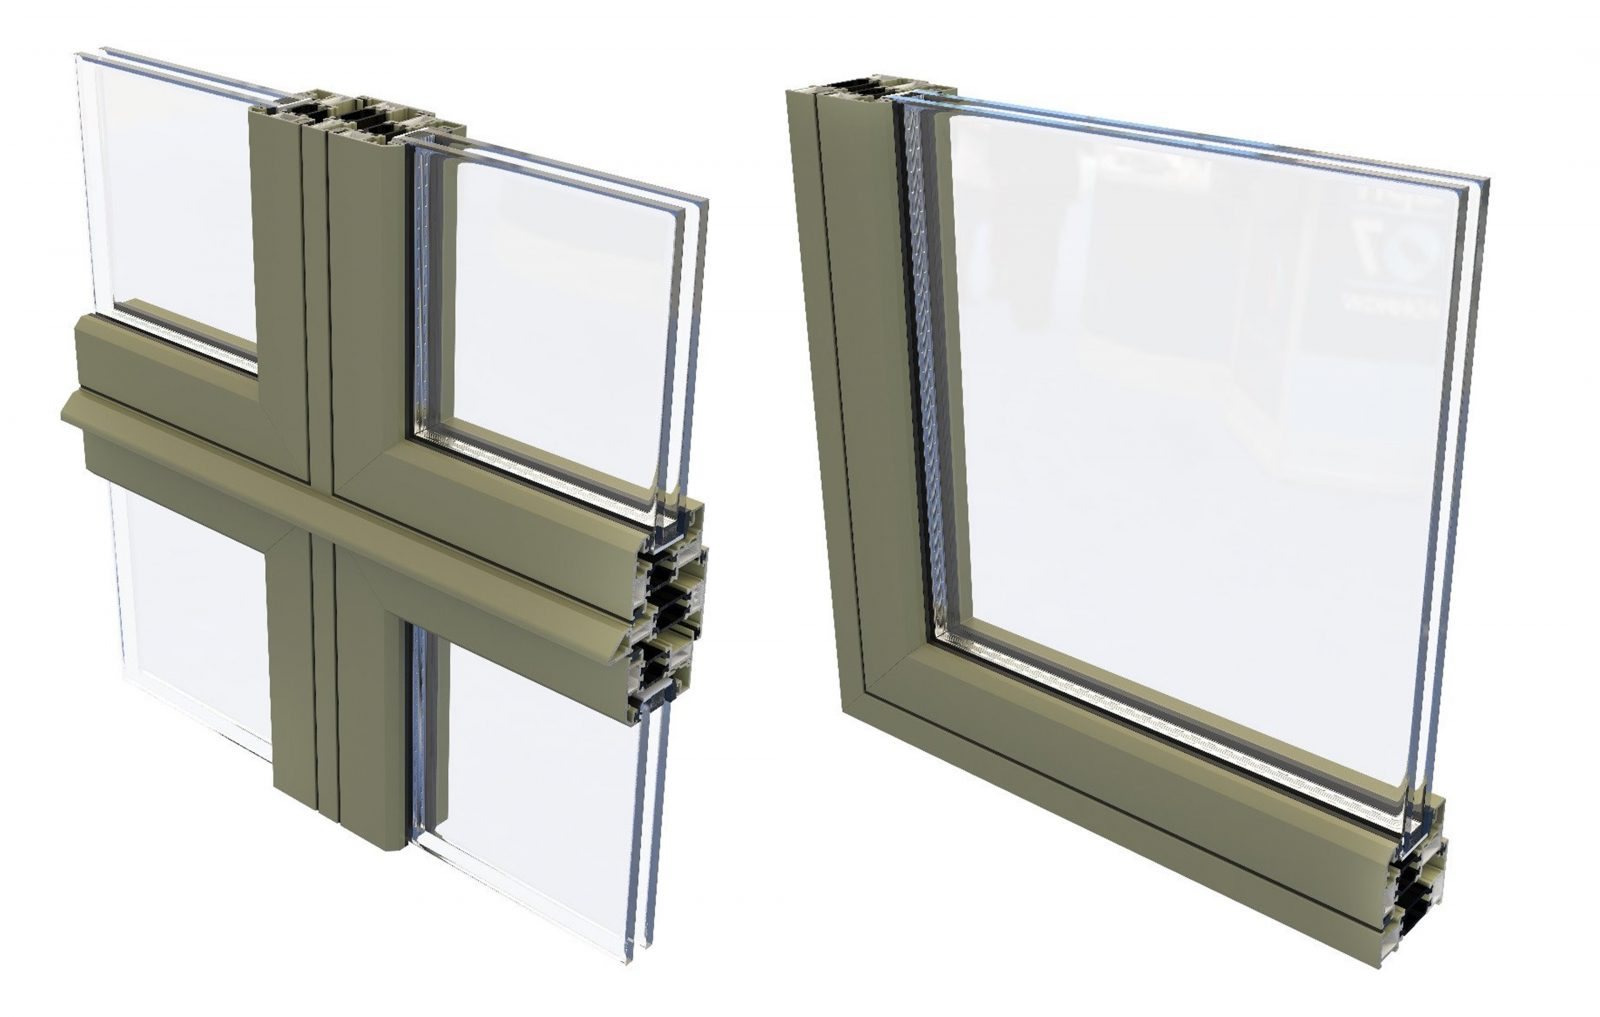 Smarts Alitherm 500 aluminium flush casement